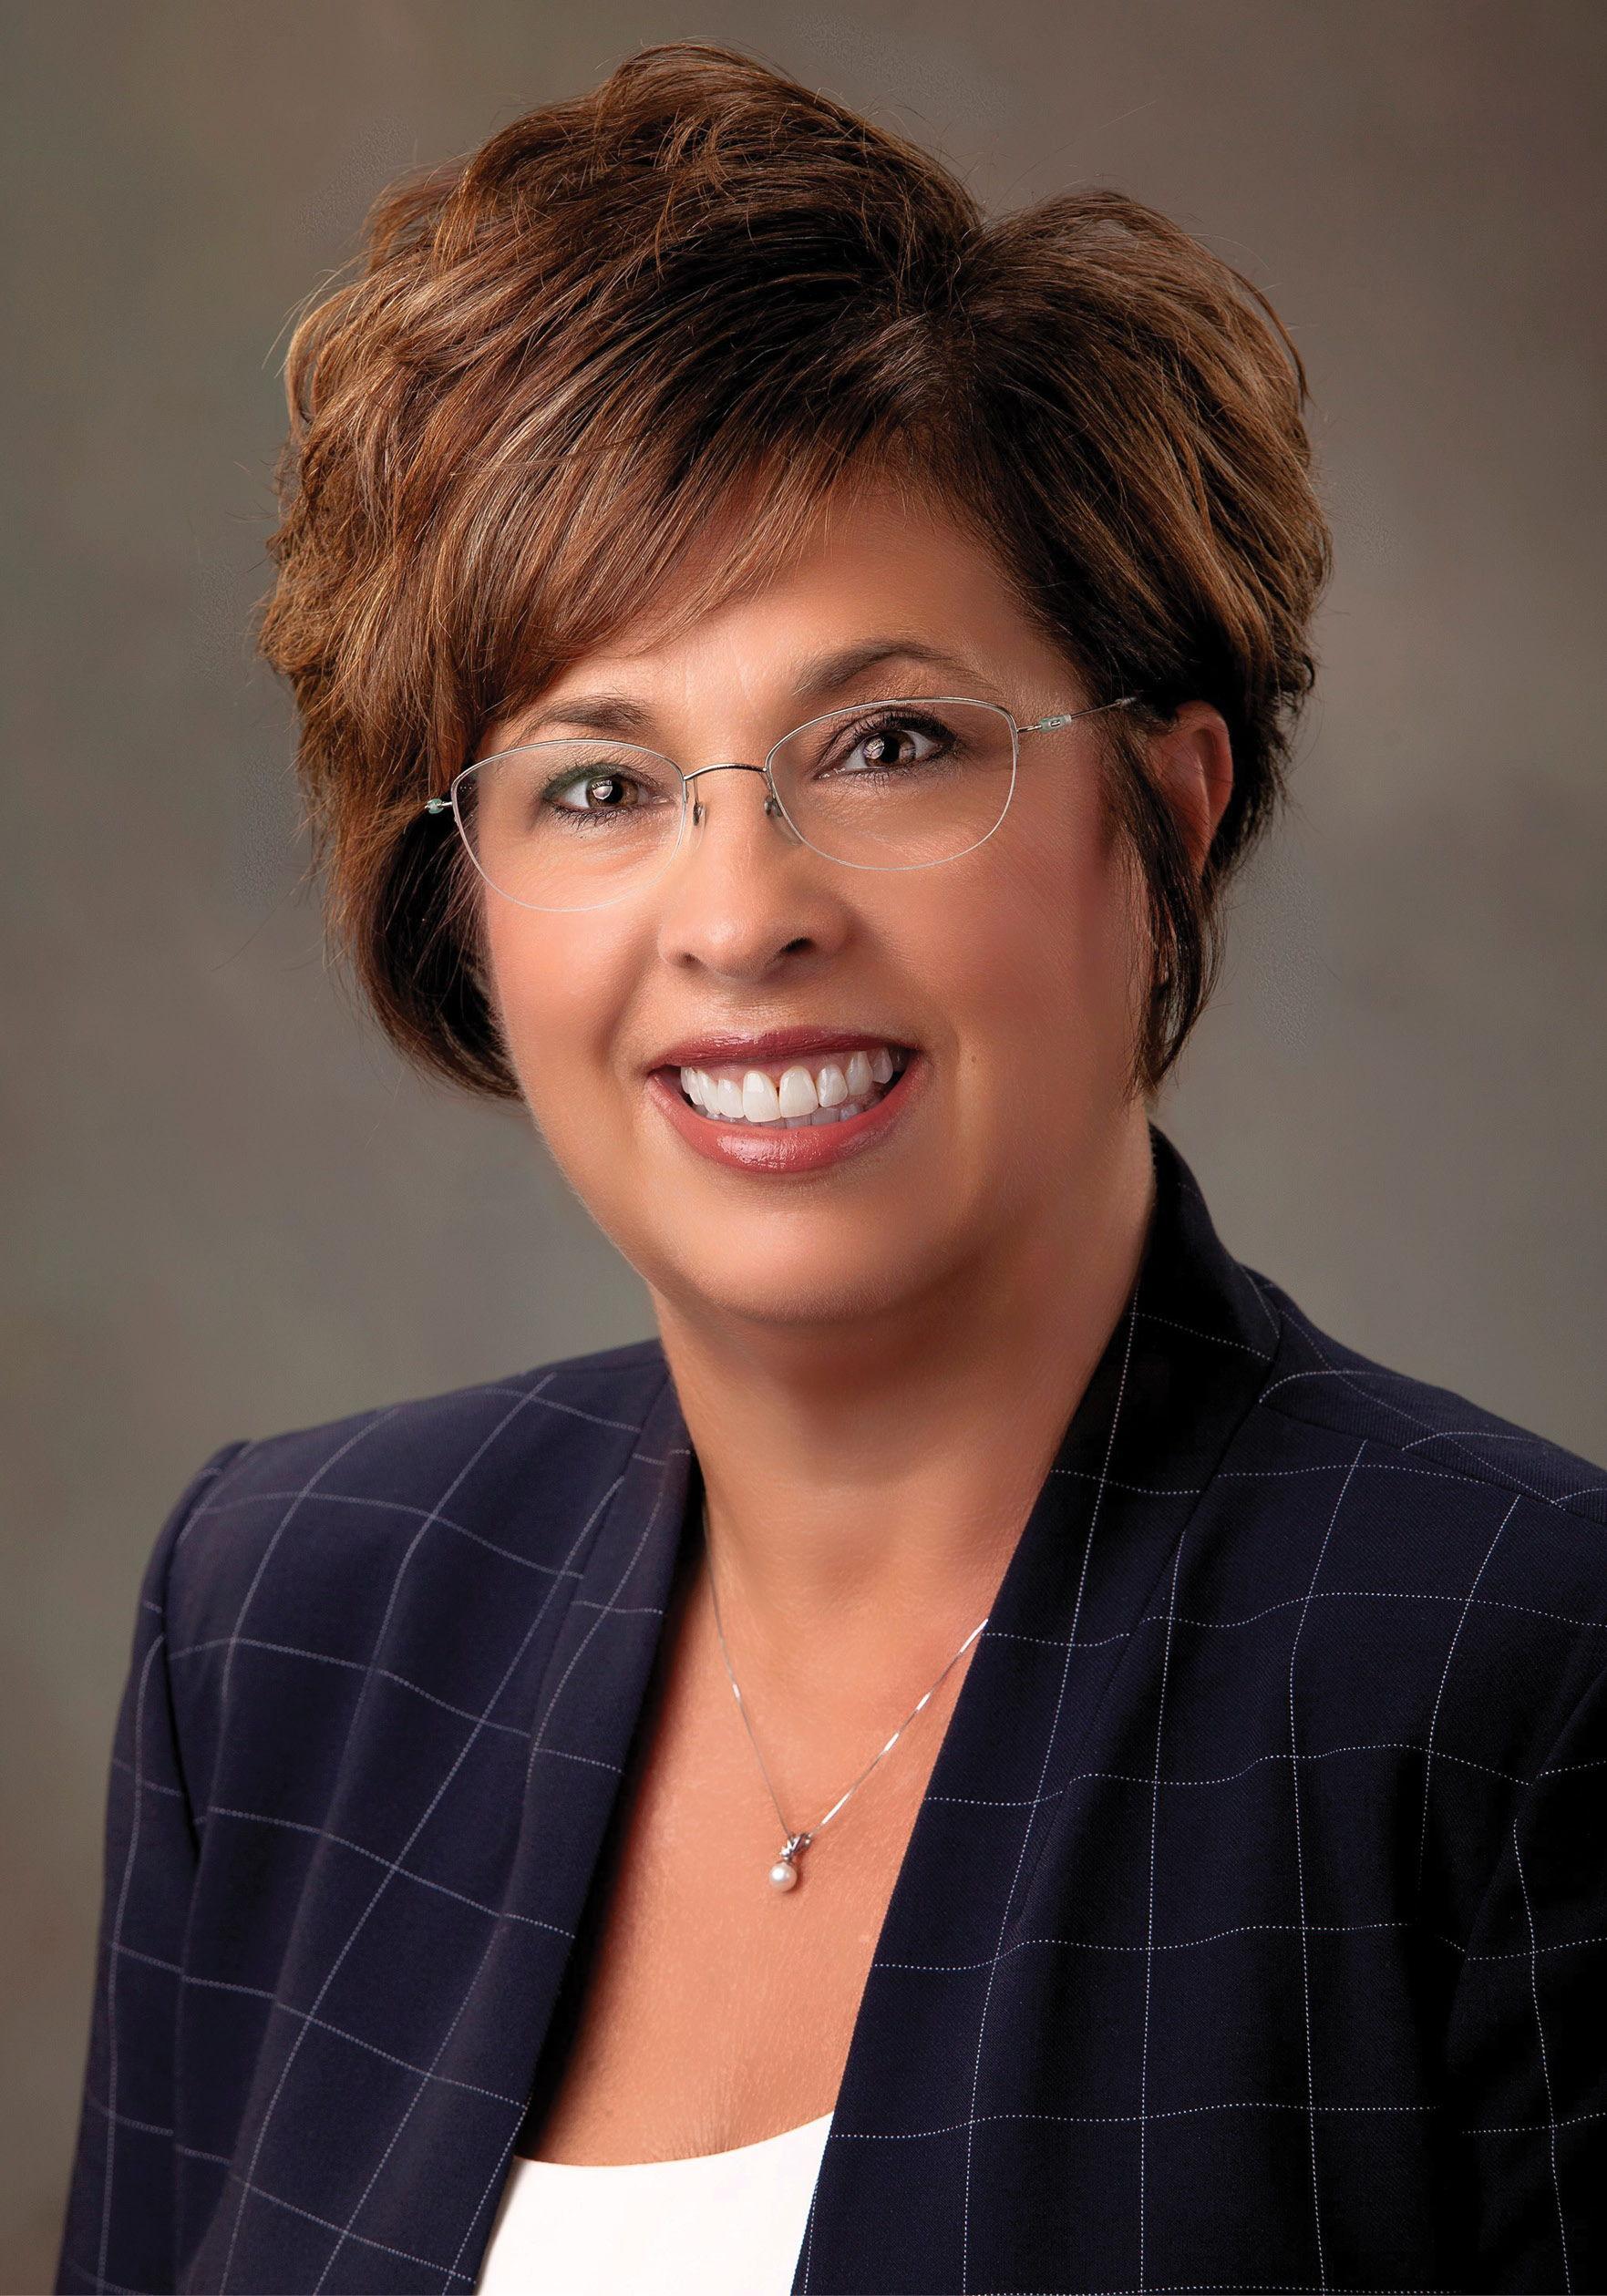 Indiana Senator Stacey Donato